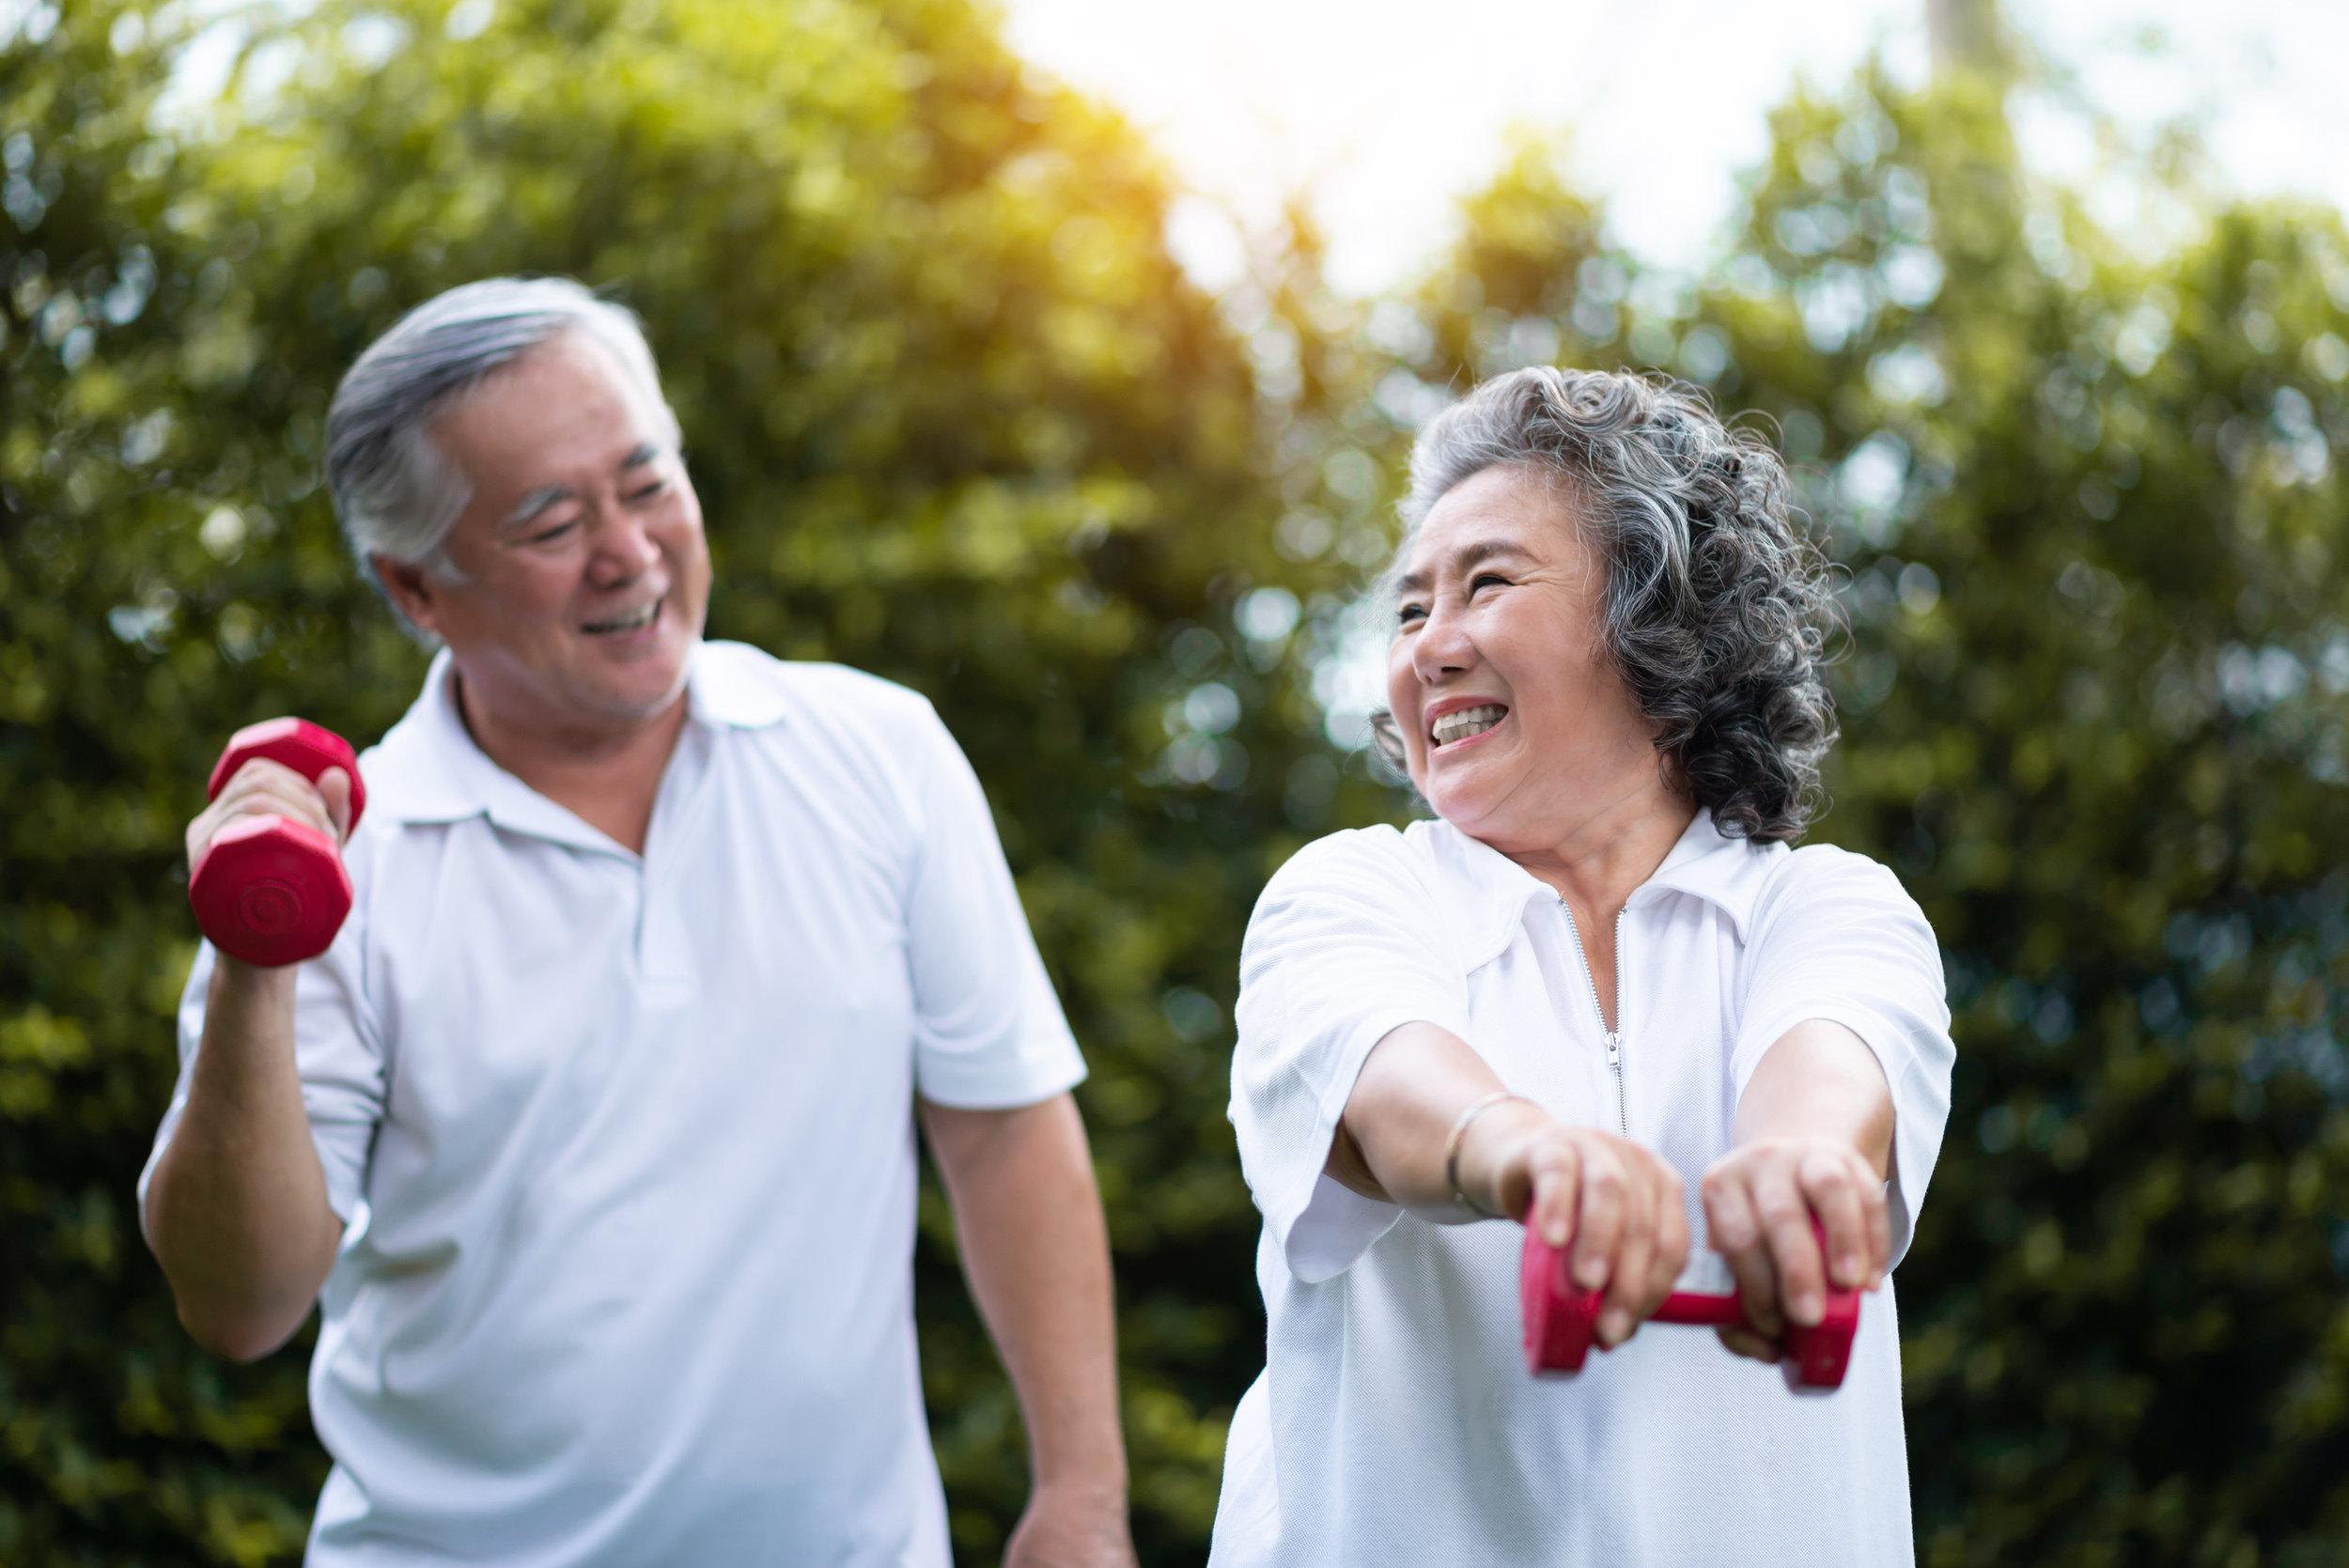 bigstock-Asian-Senior-Couple-Exercising-278255323.jpg